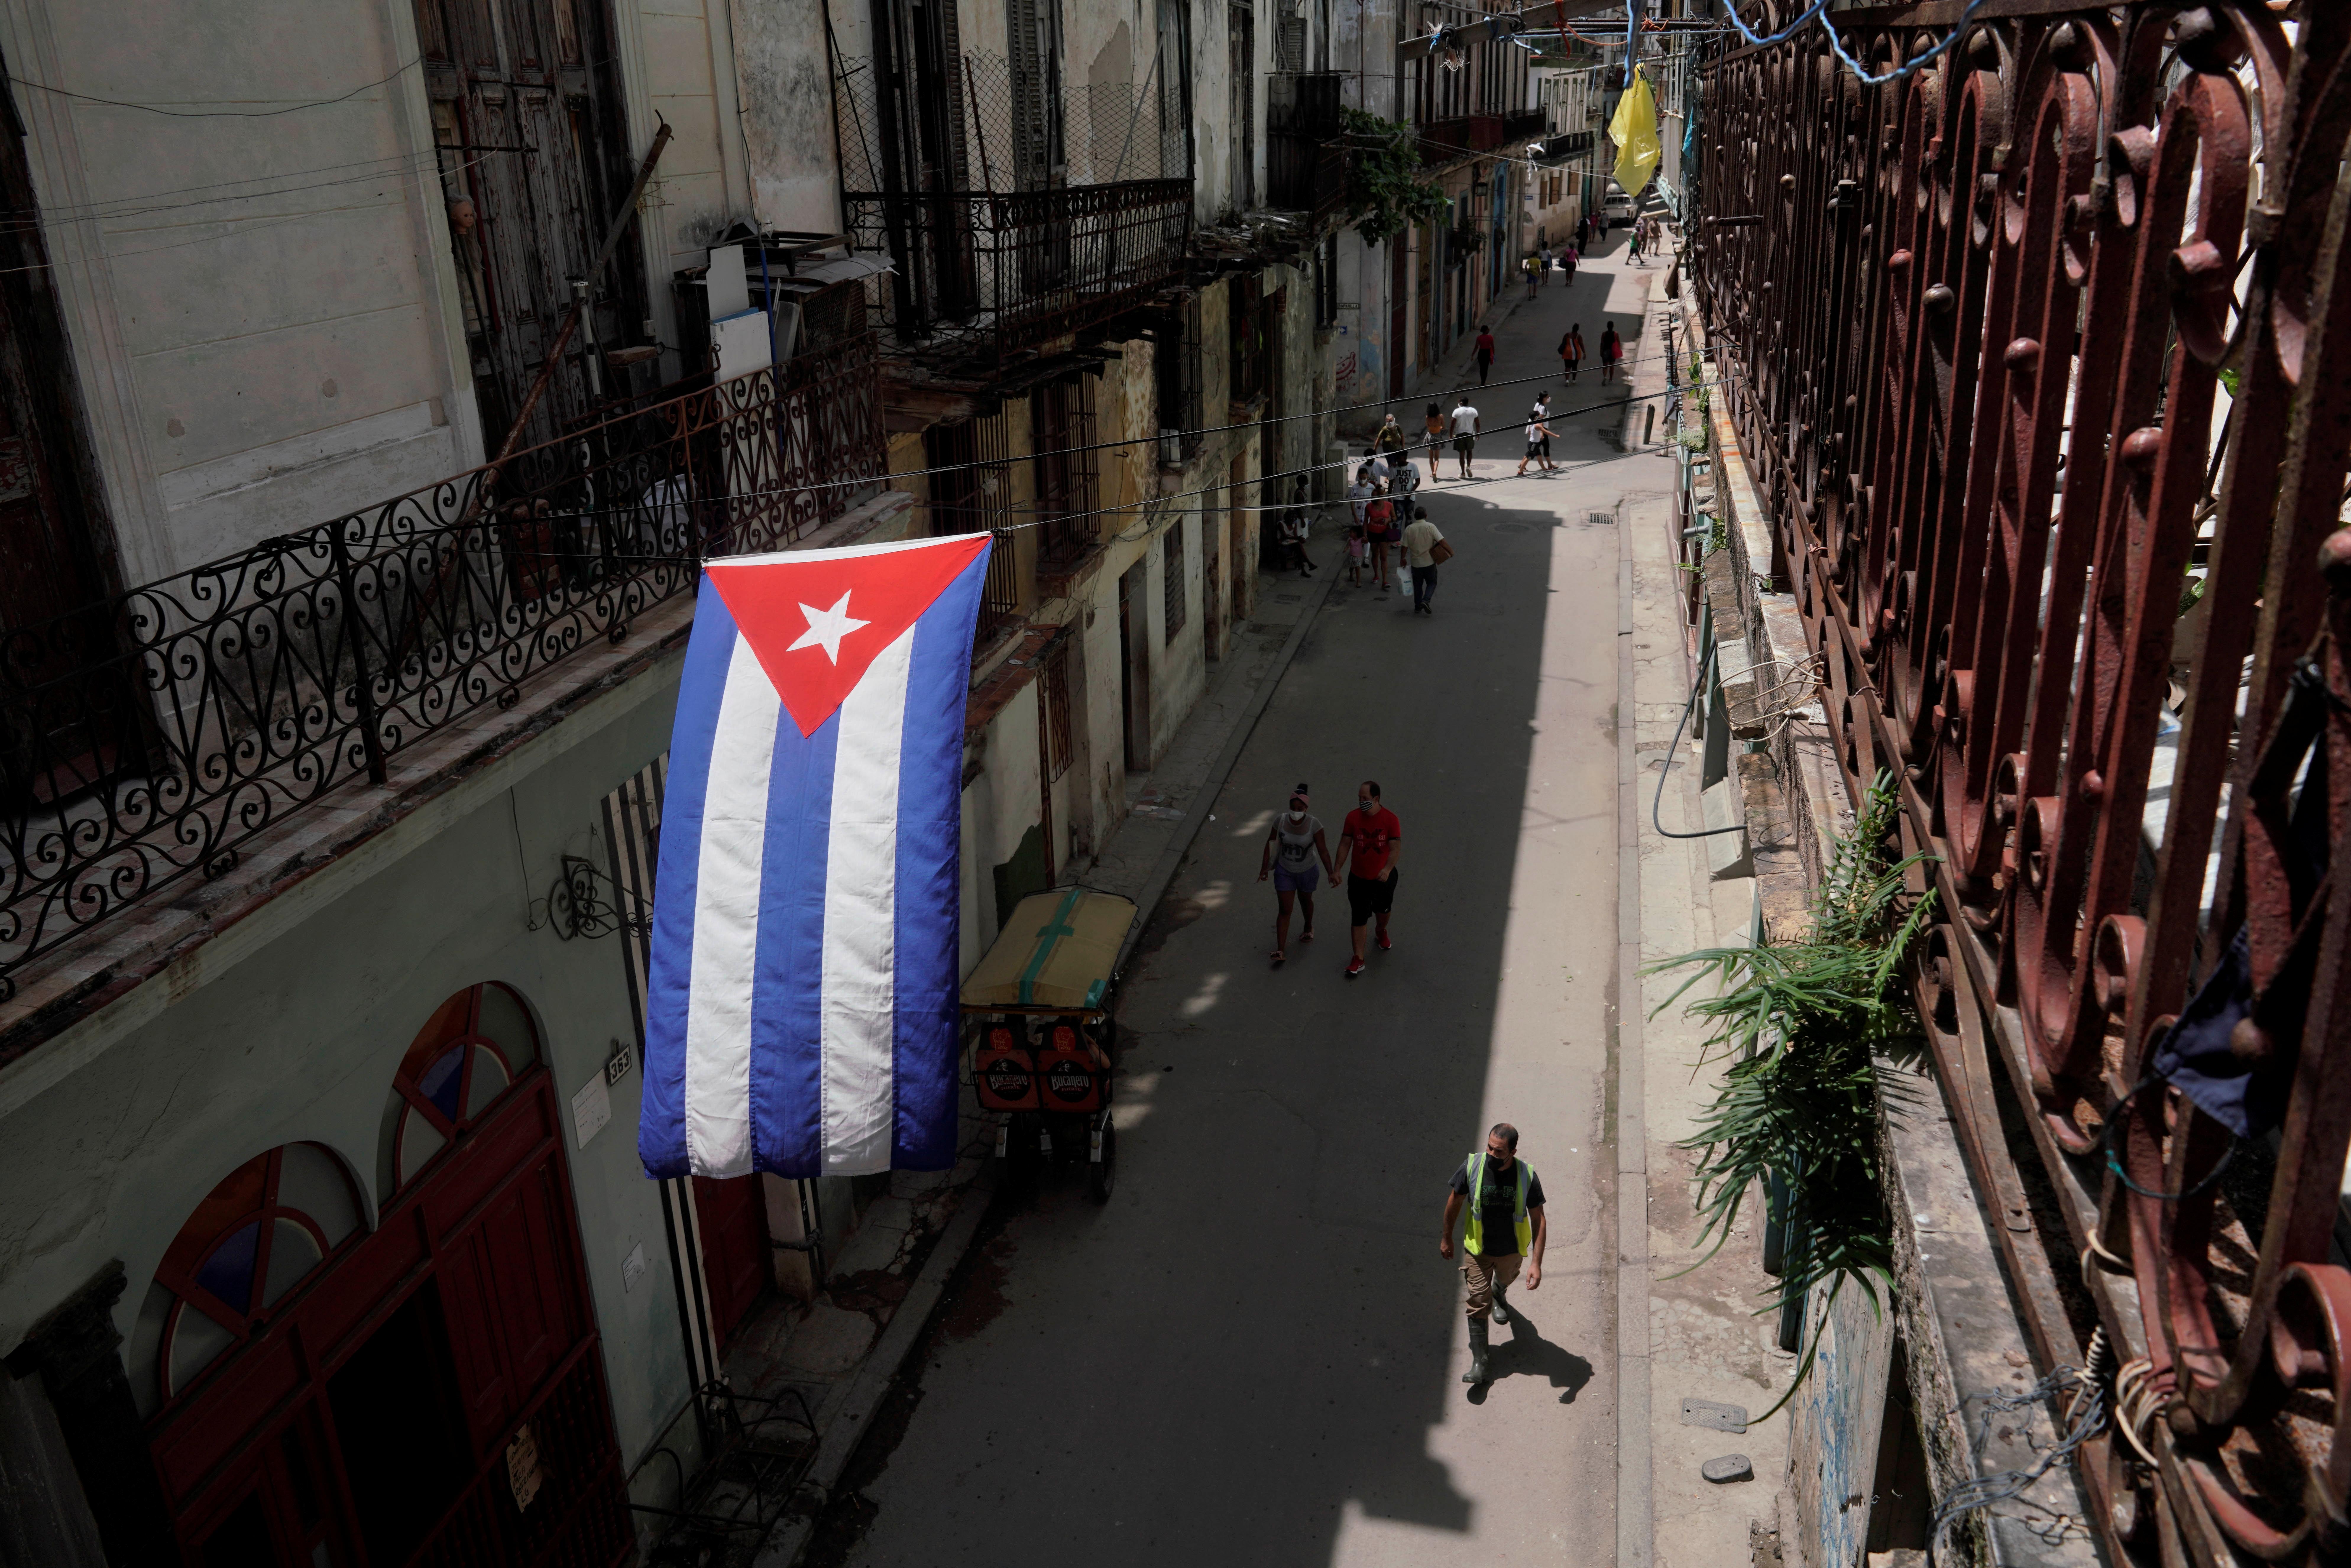 A Cuban flag hangs over a street in downtown Havana, Cuba, July 15, 2021. REUTERS/Alexandre Meneghini